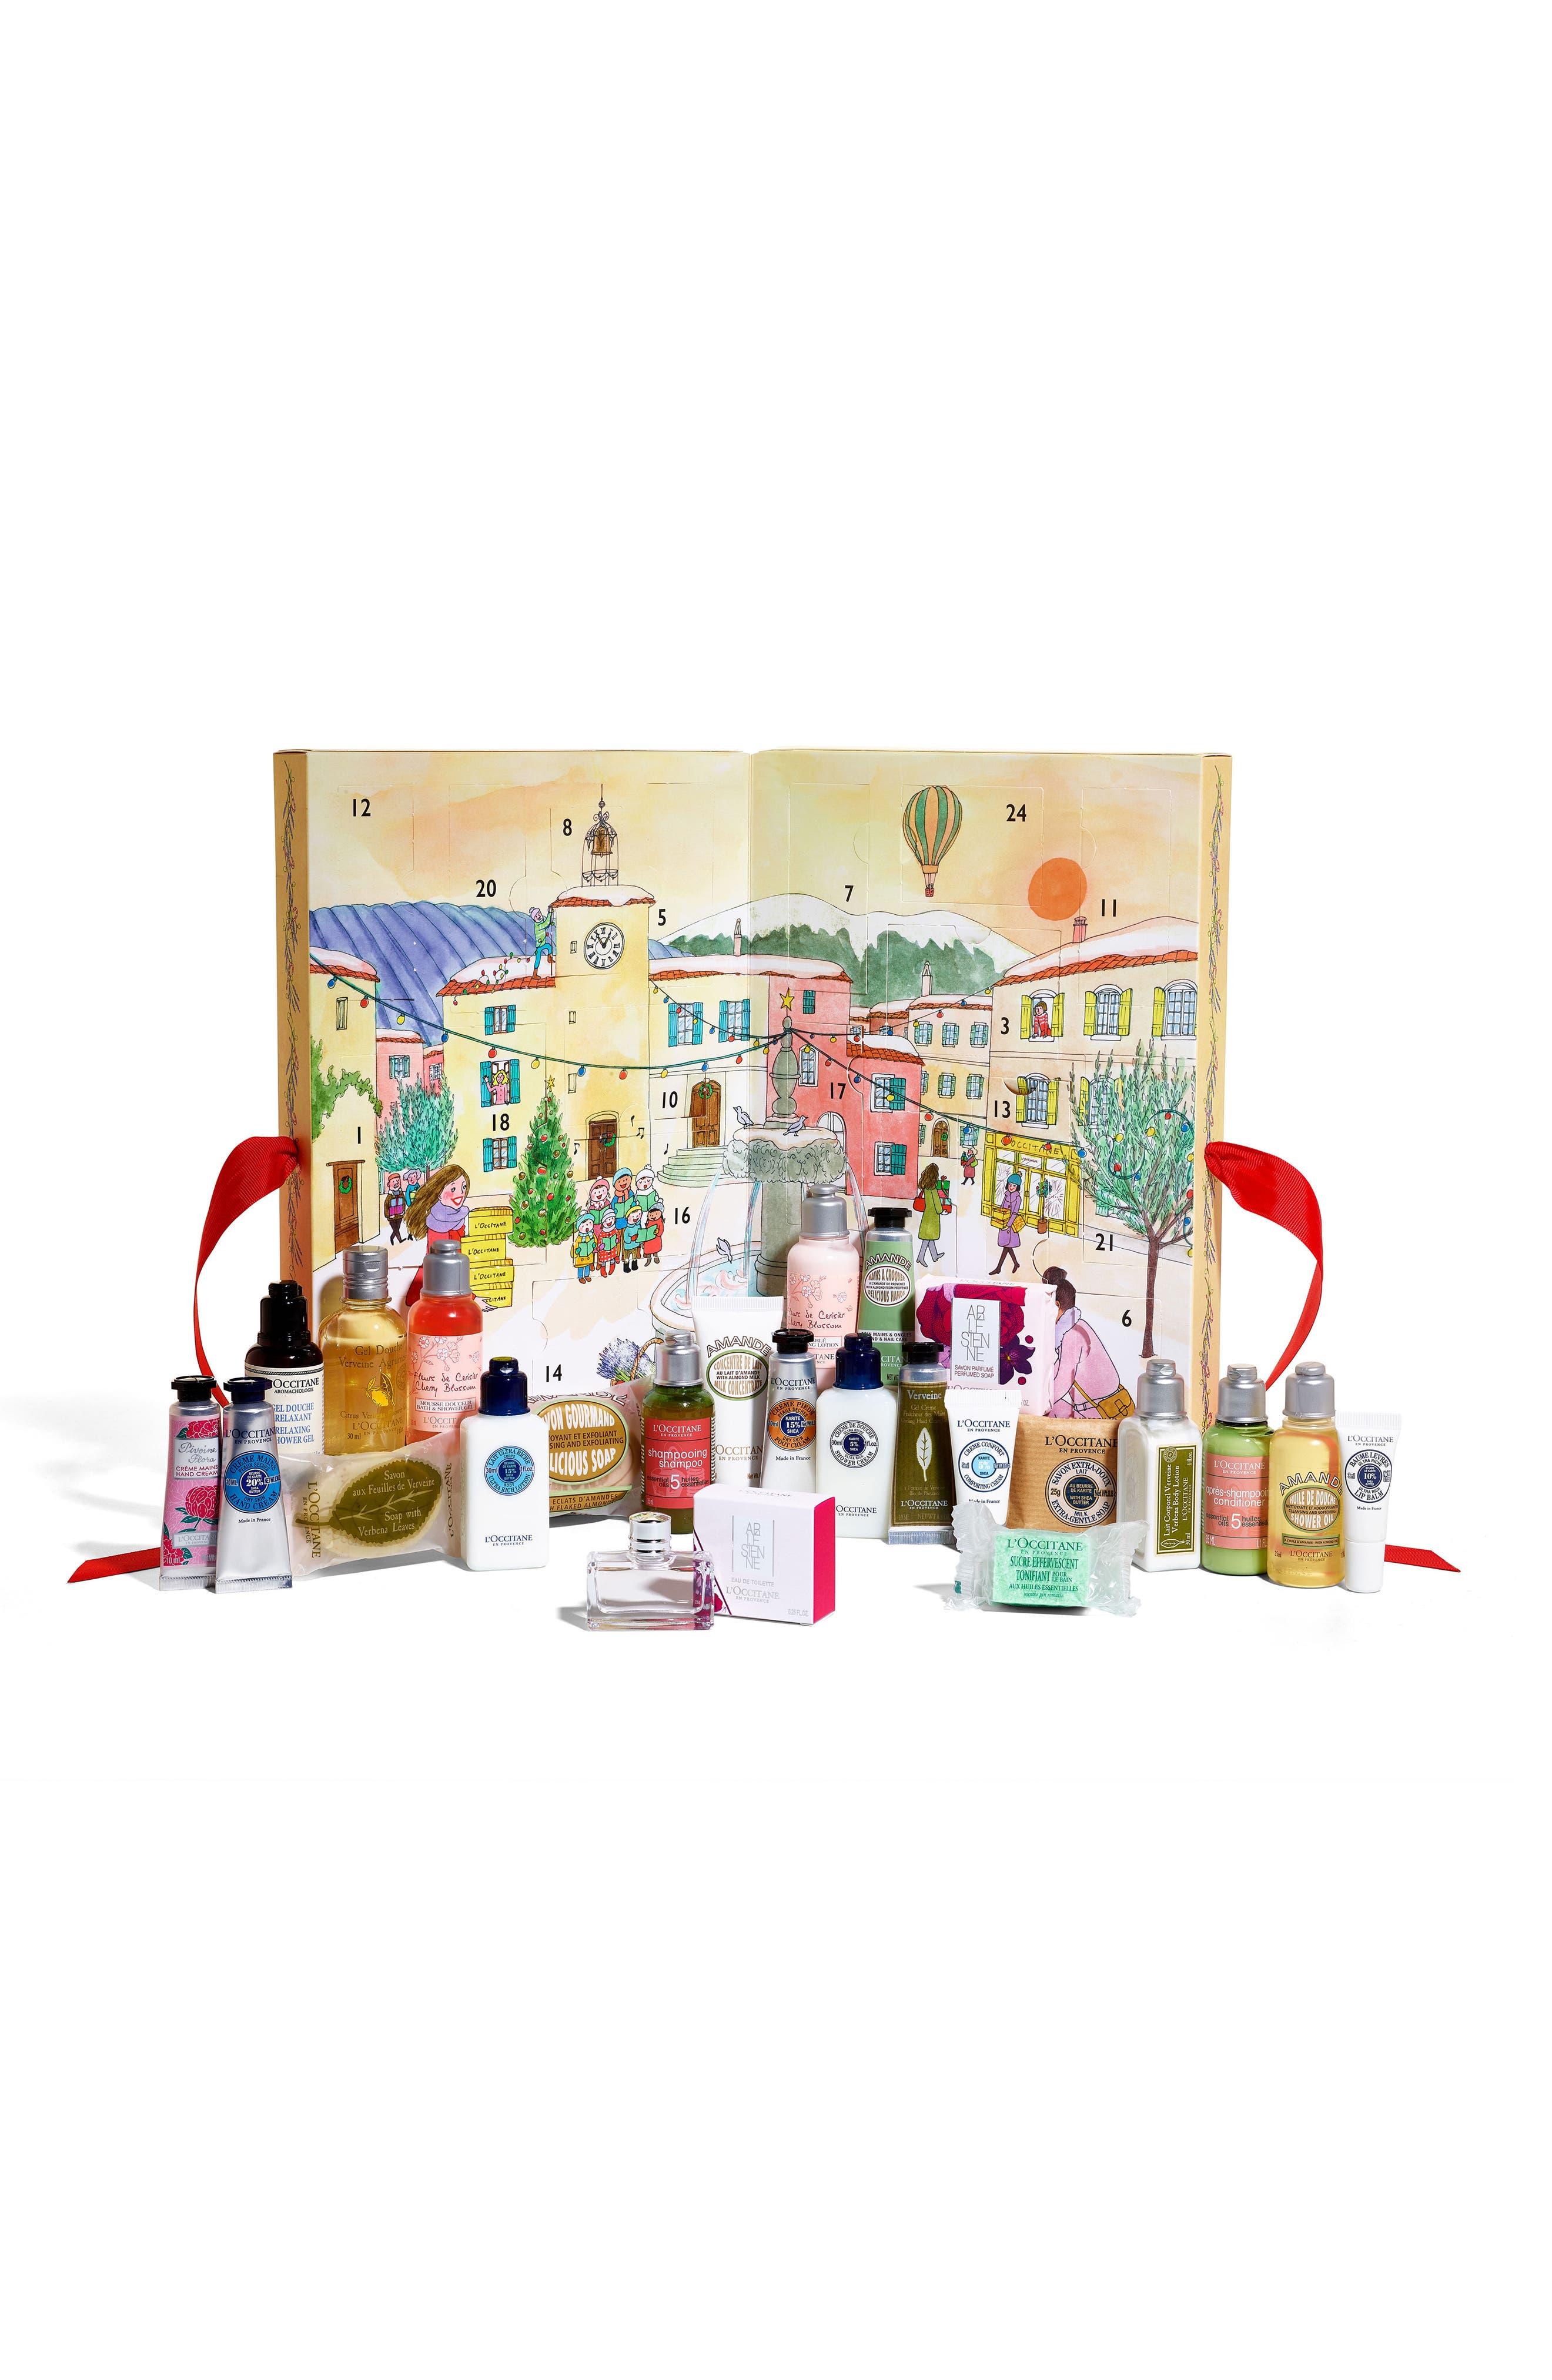 L'Occitane Advent Calendar Collection ($103.50 Value)